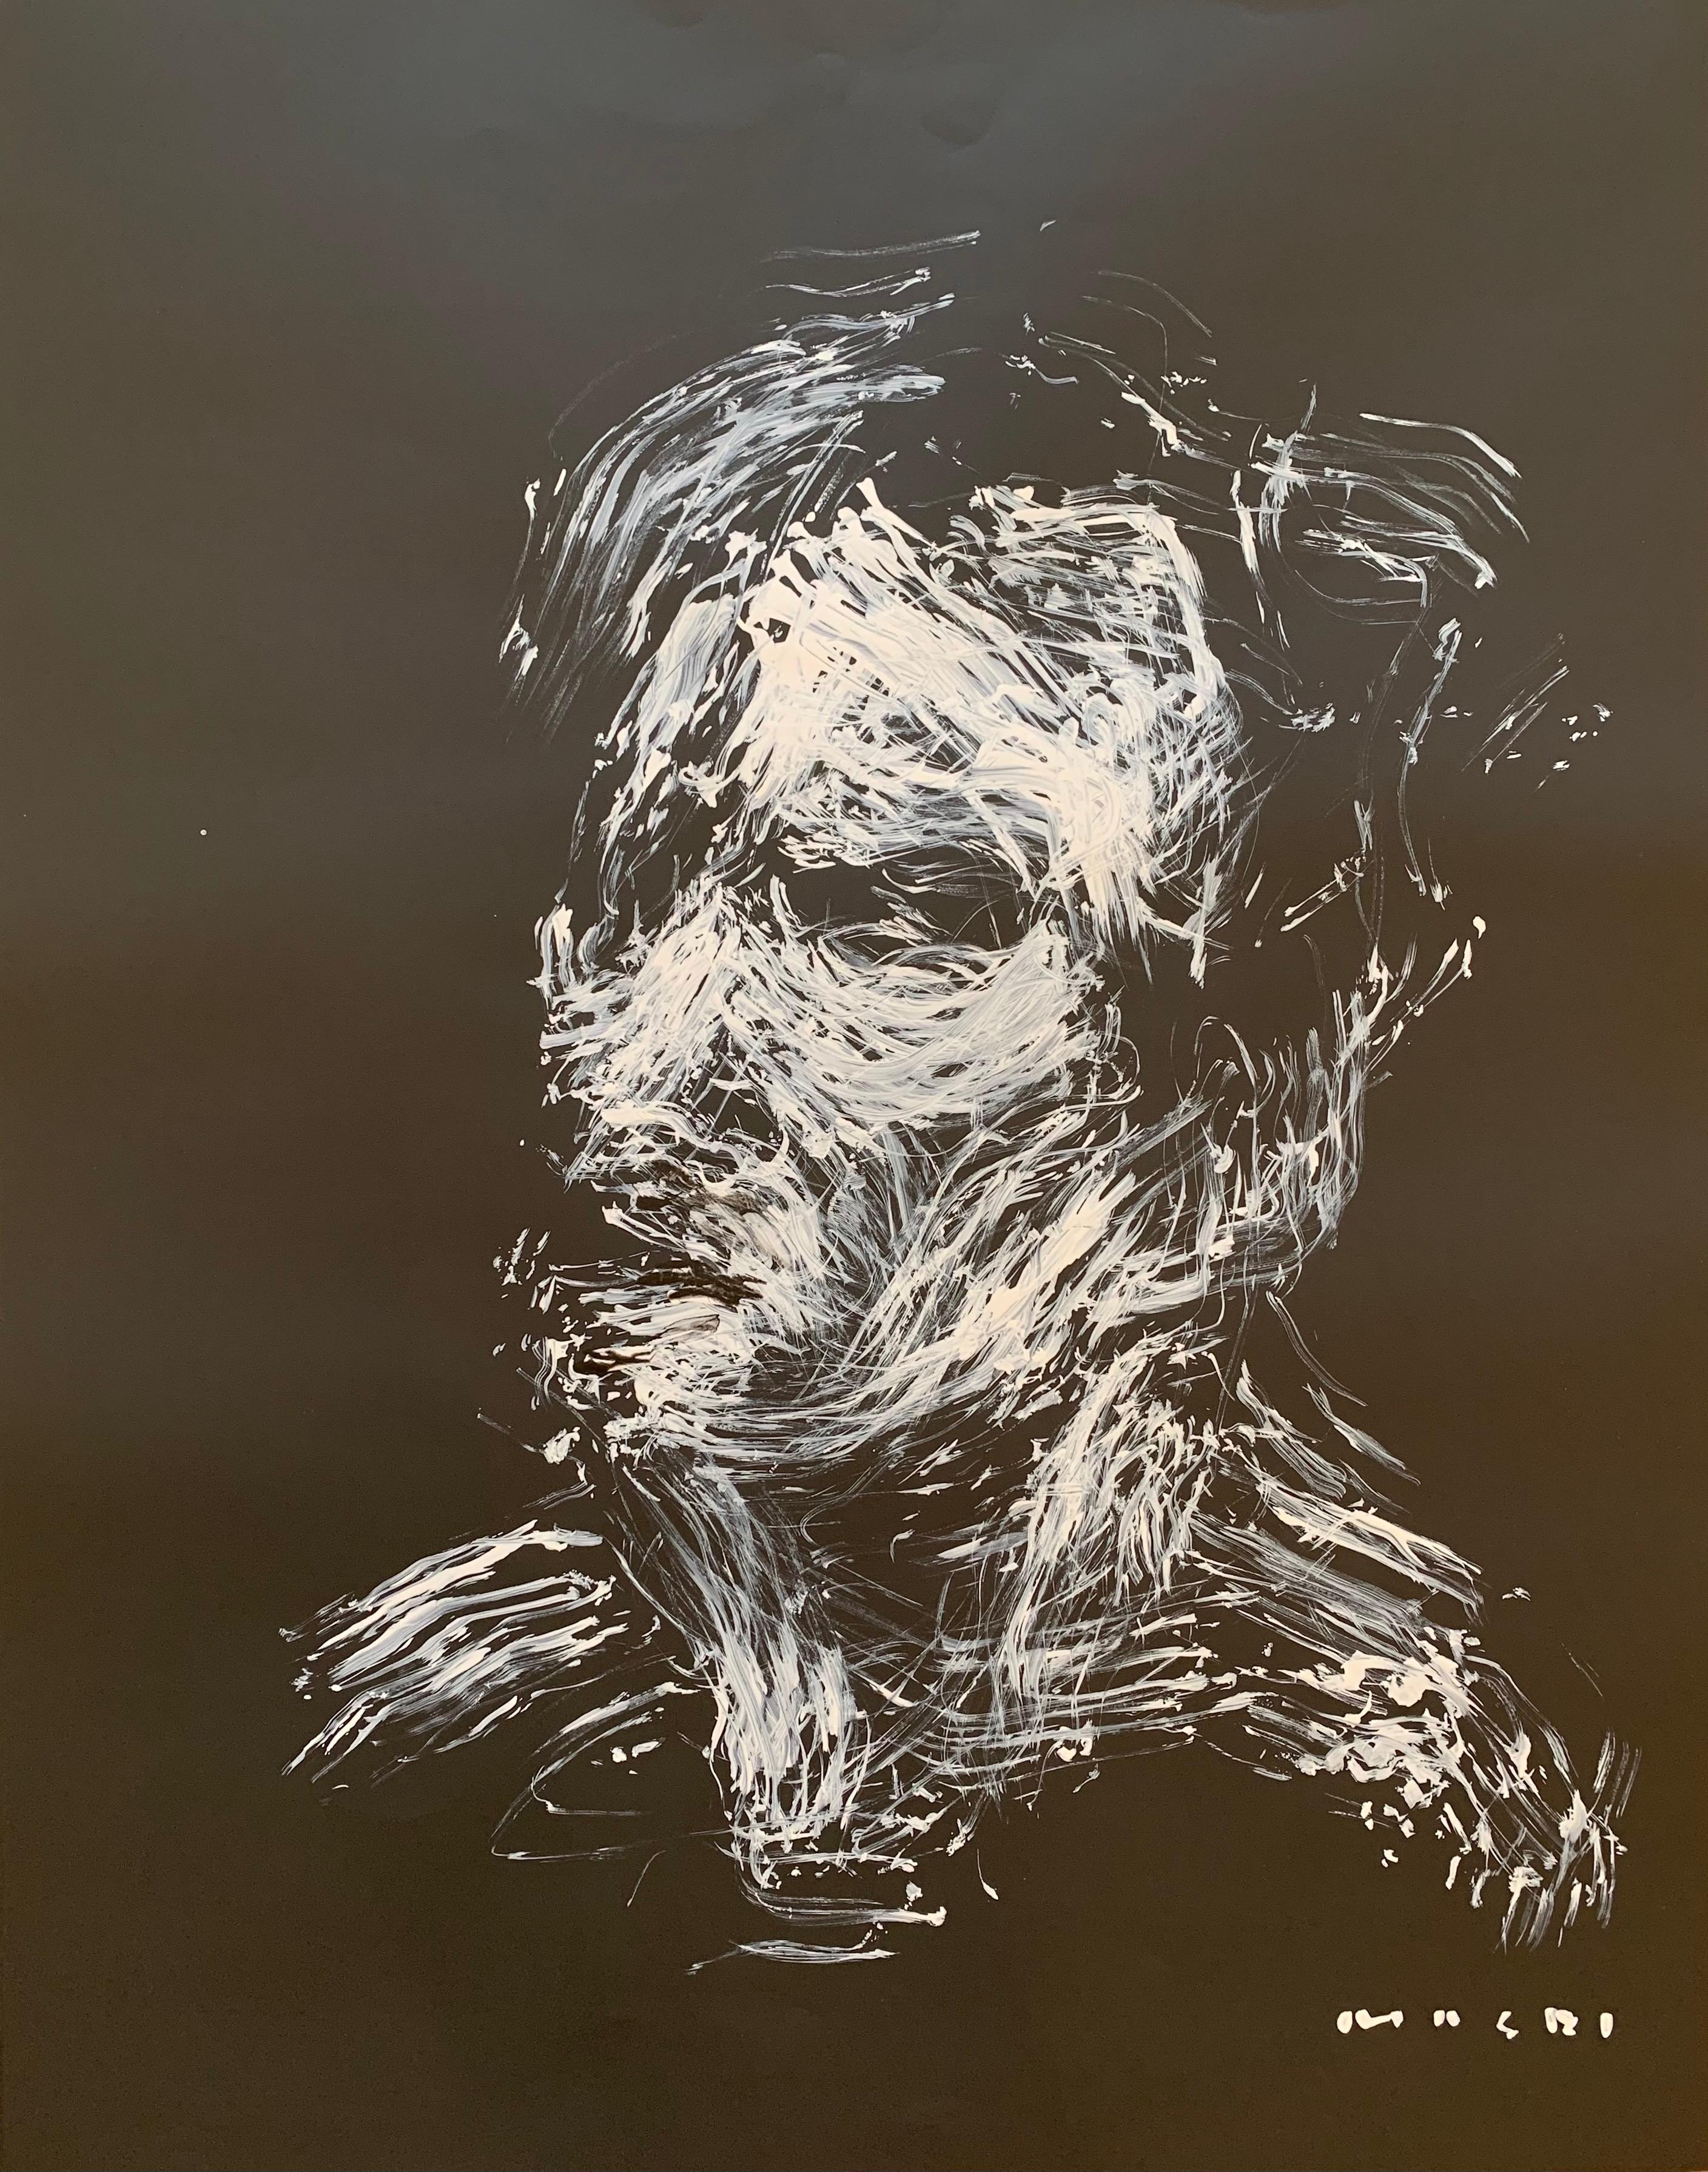 """self portrait-homage to Van Gogh"" Oil on paper Original piece by Masri"